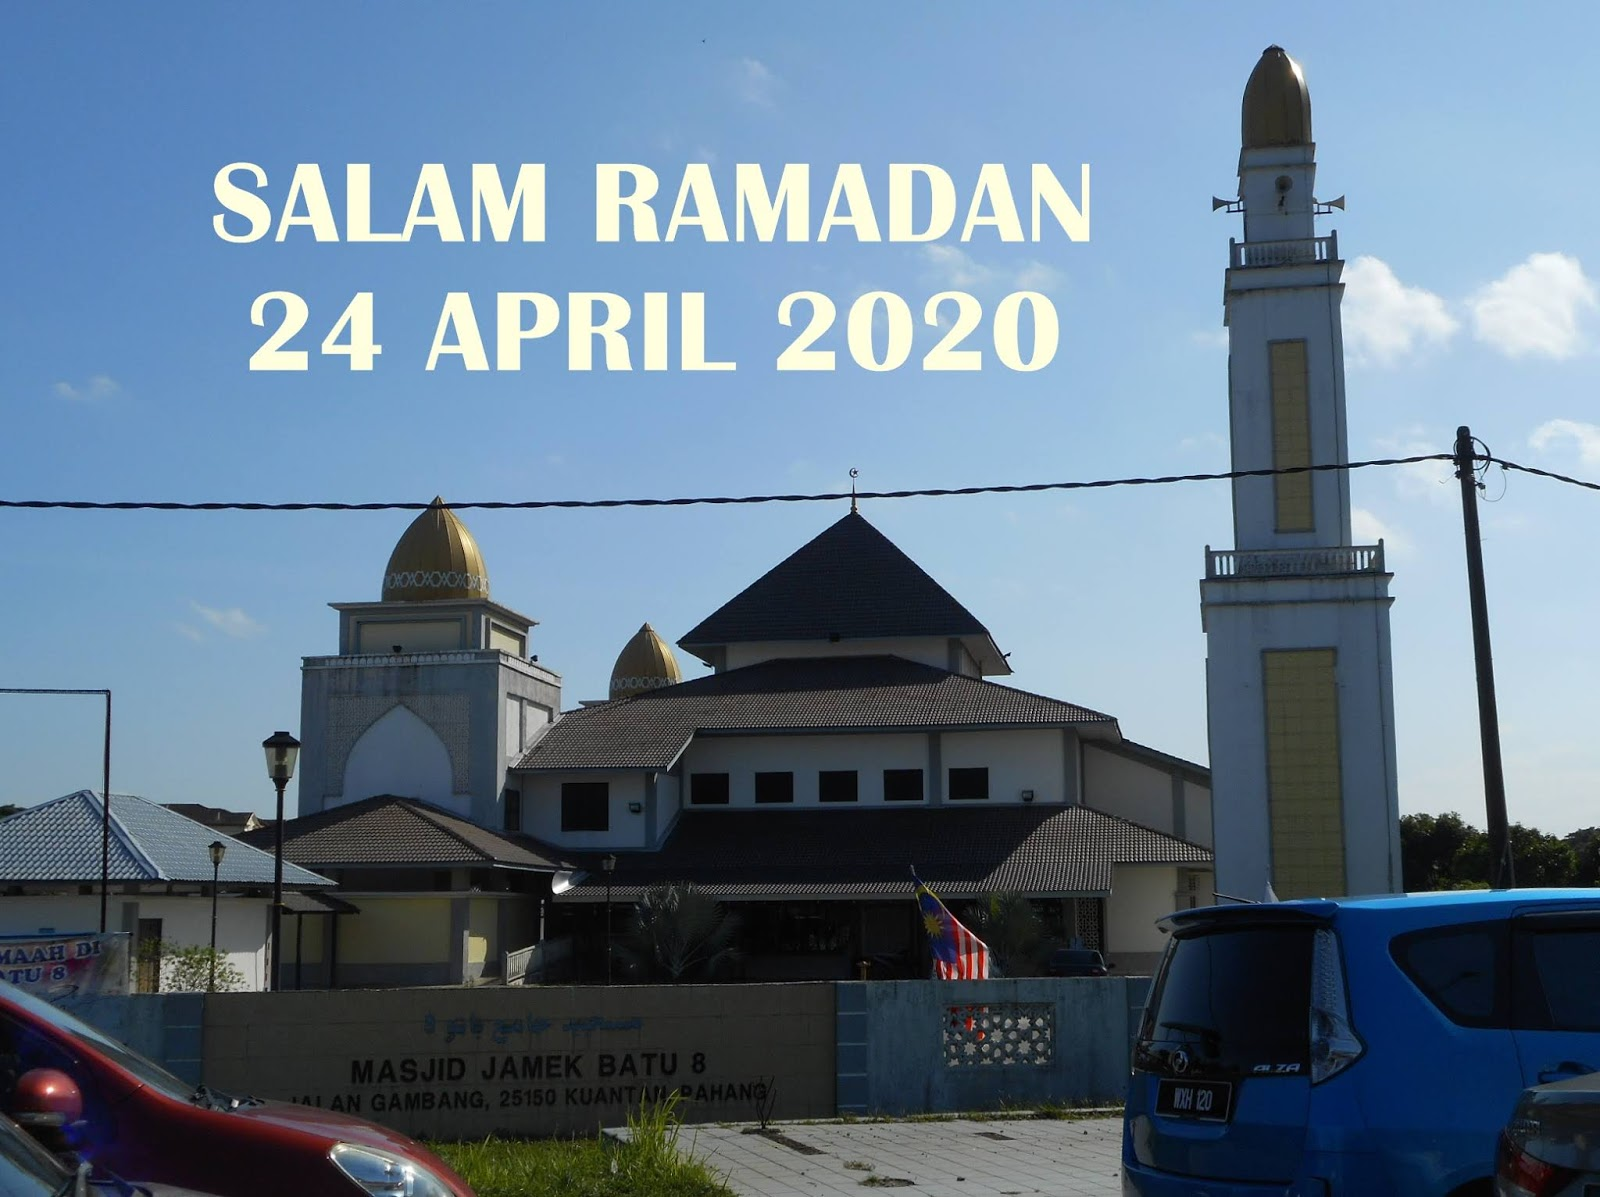 Salam Ramadan 2020